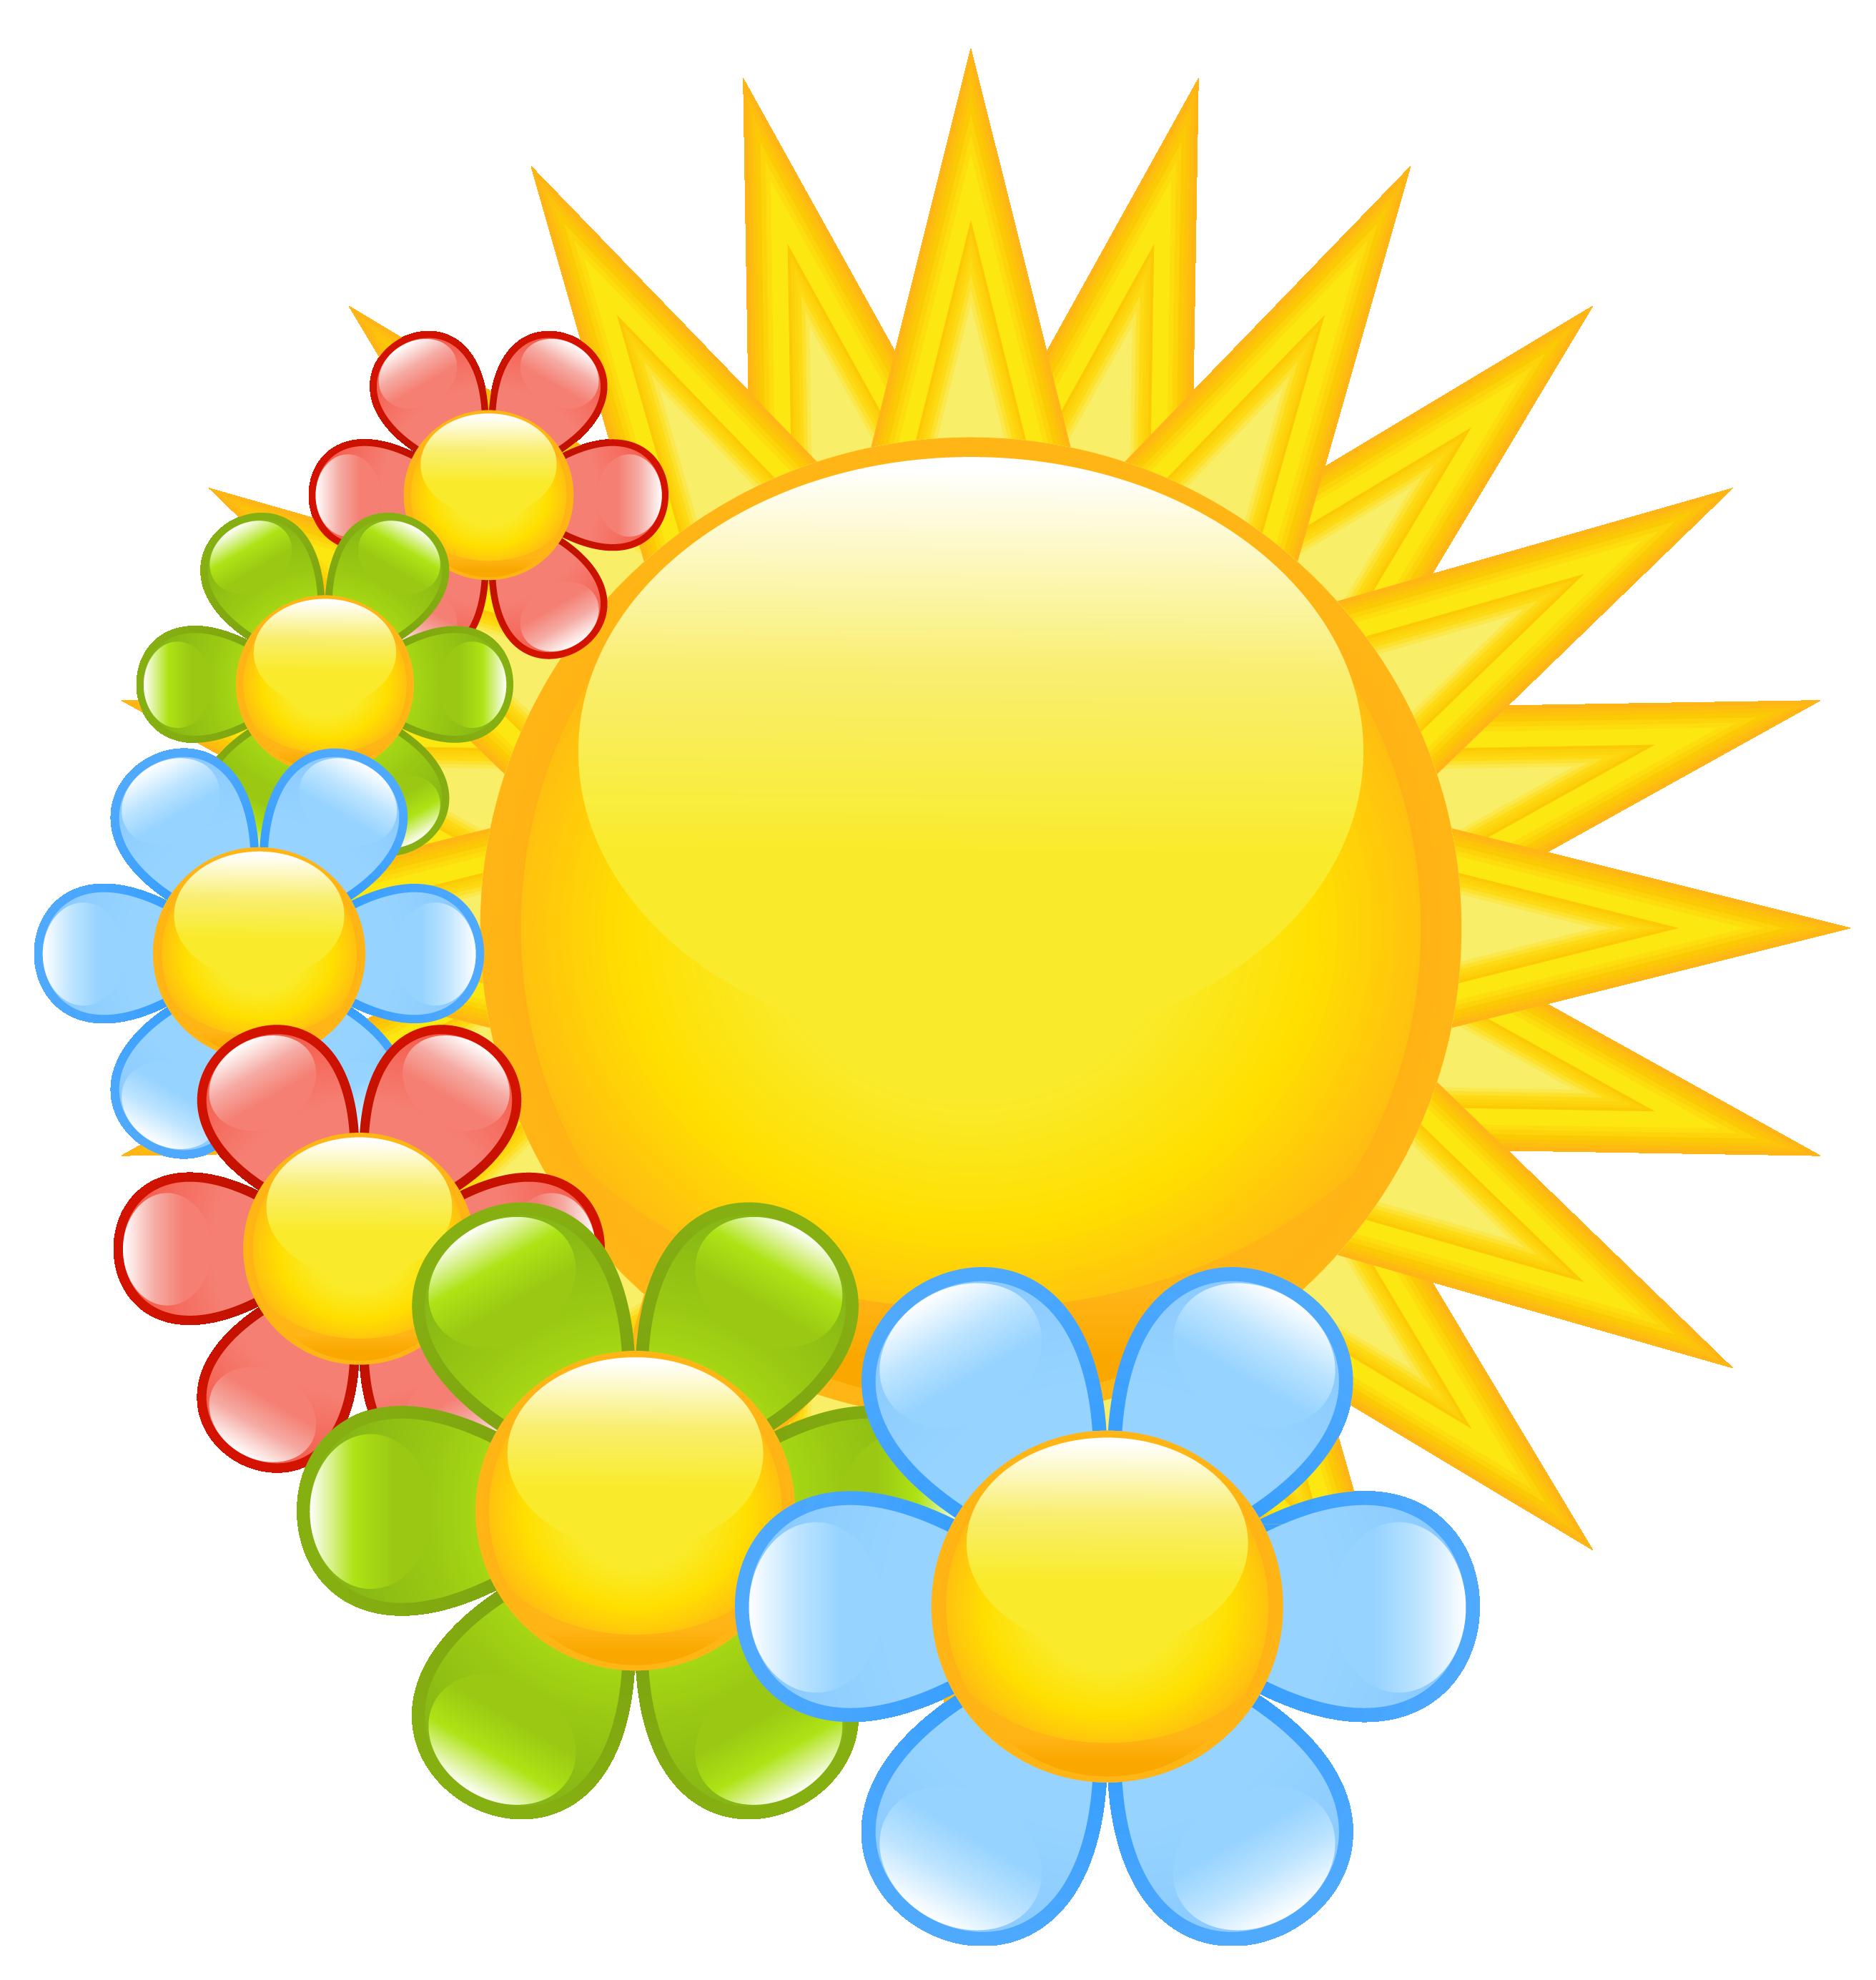 Sunflower Clipart Free Sunflower Clip Art Clipart Free